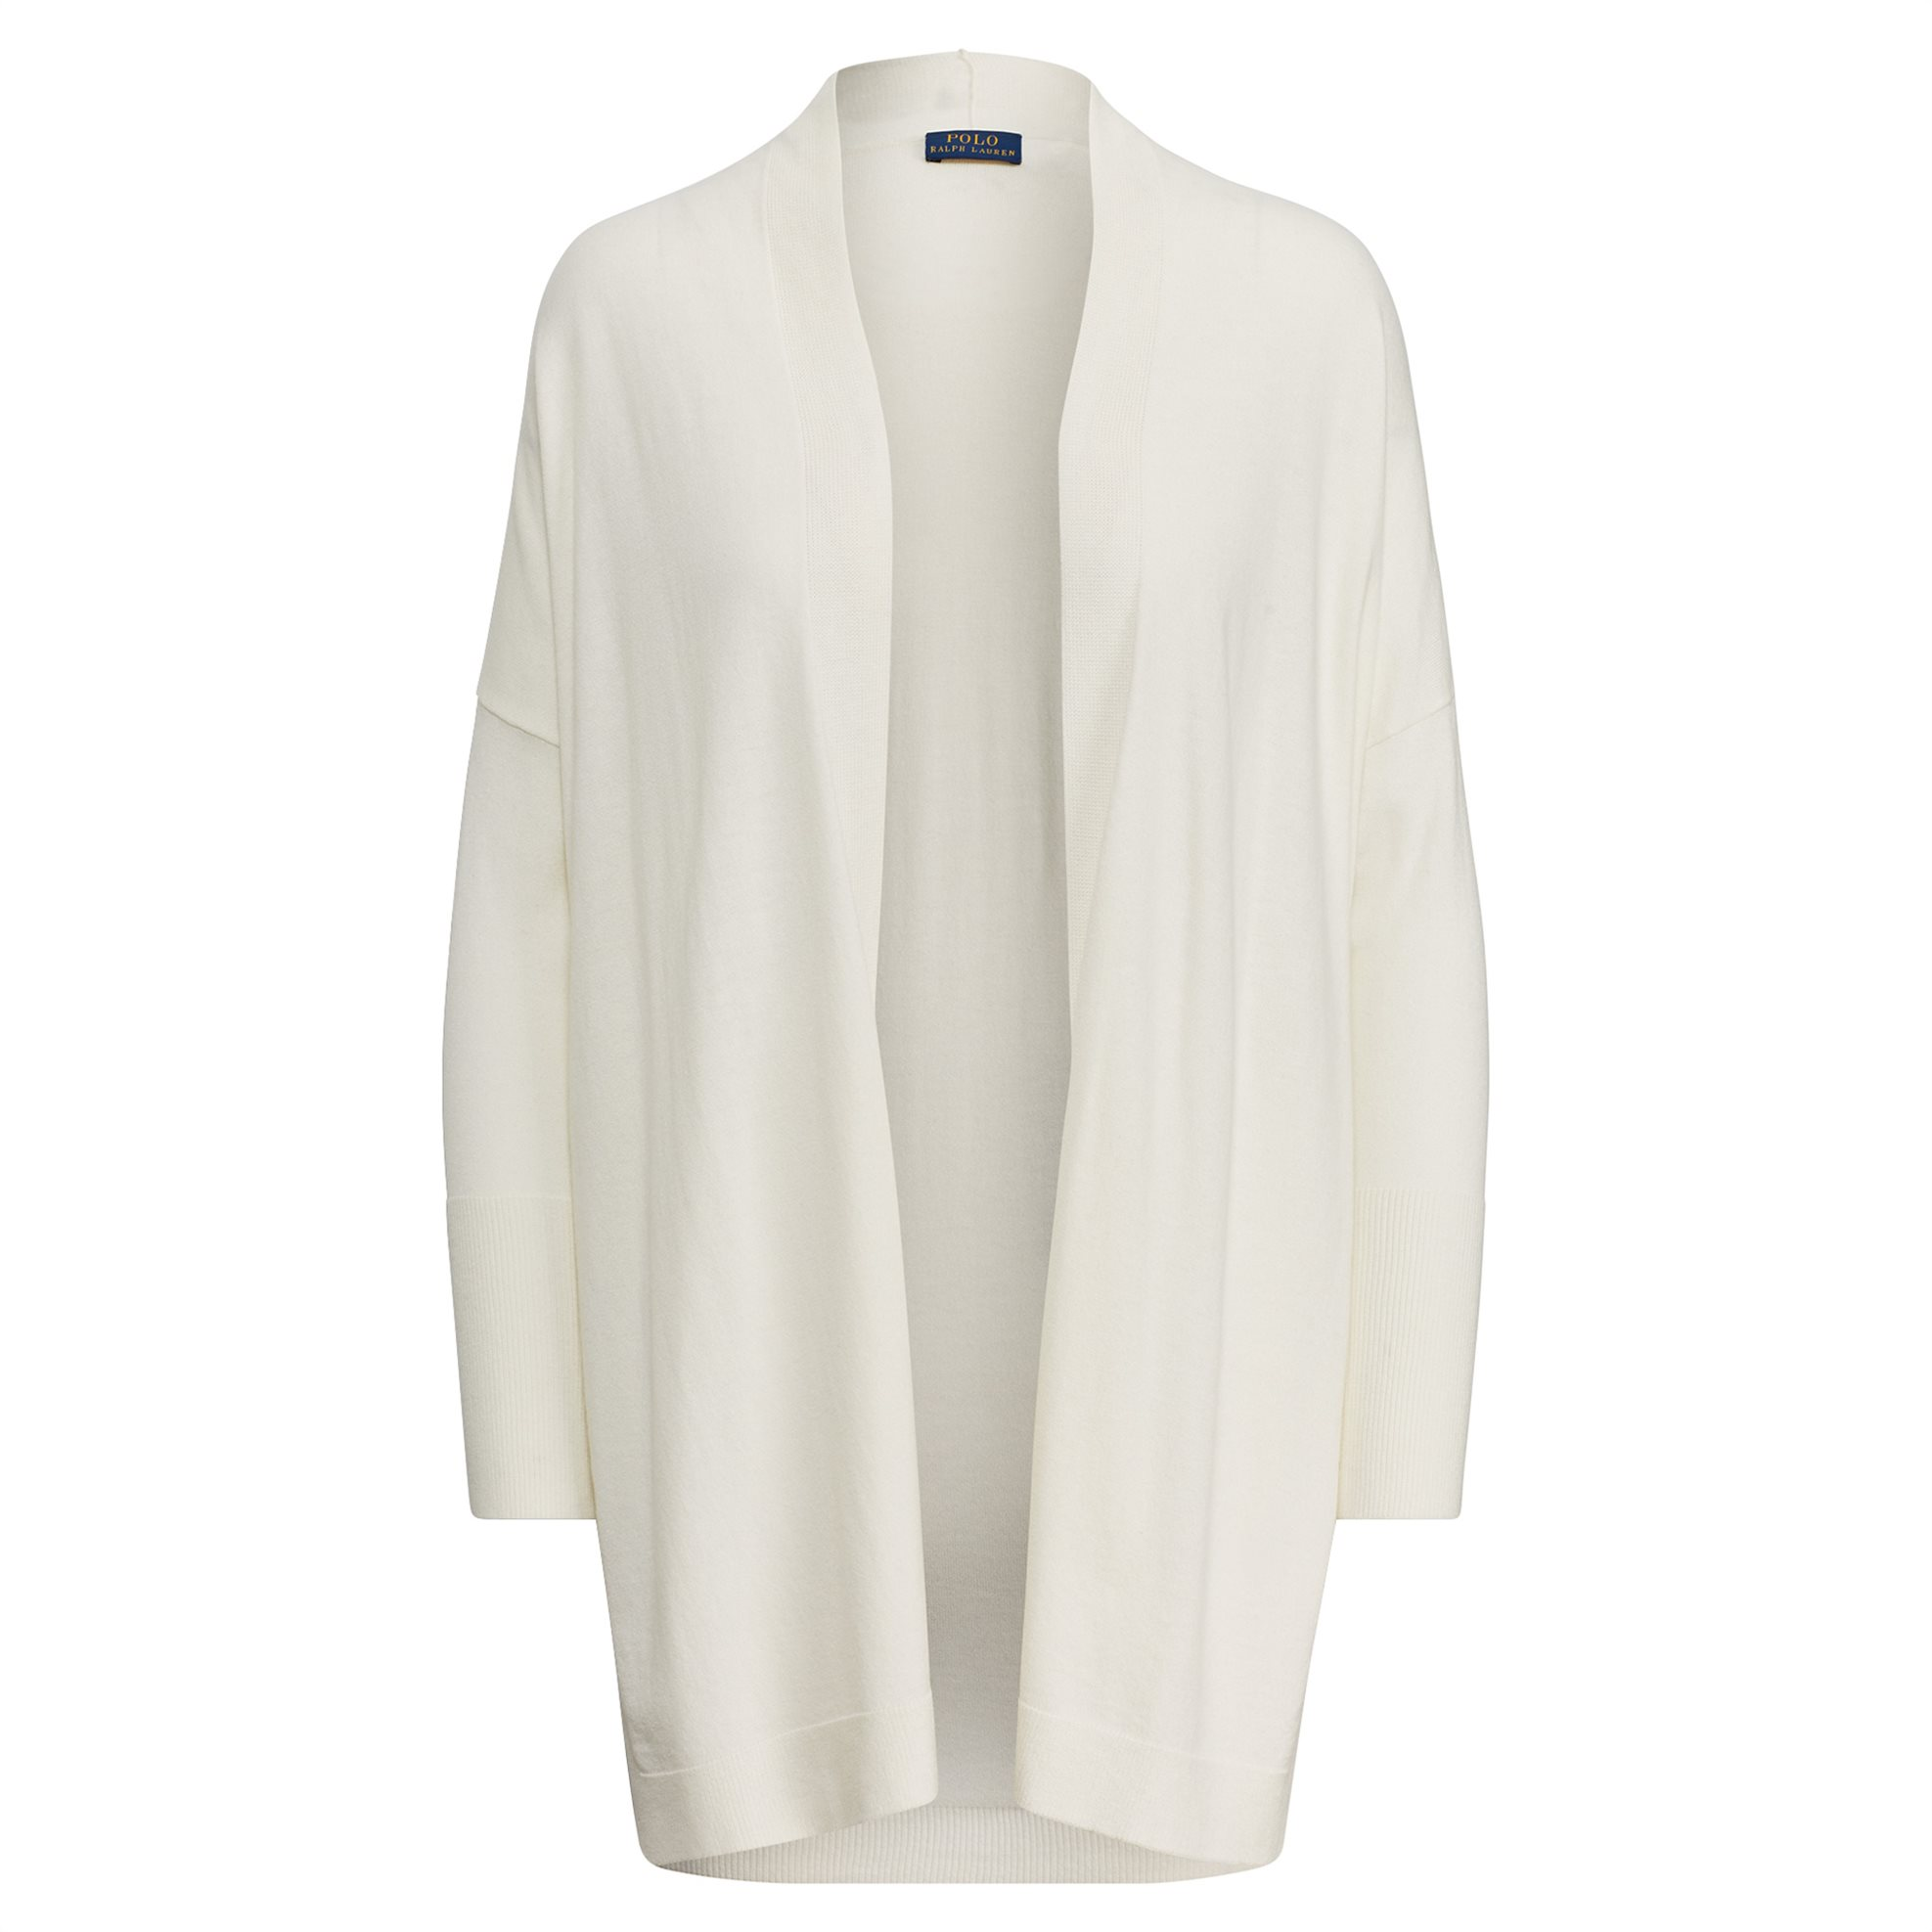 Polo Ralph Lauren γυναικεία ζακέτα πλεκτή Side-Slit Open Cardigan Cream - 211704 γυναικα   ρουχα   πλεκτά   ζακέτες